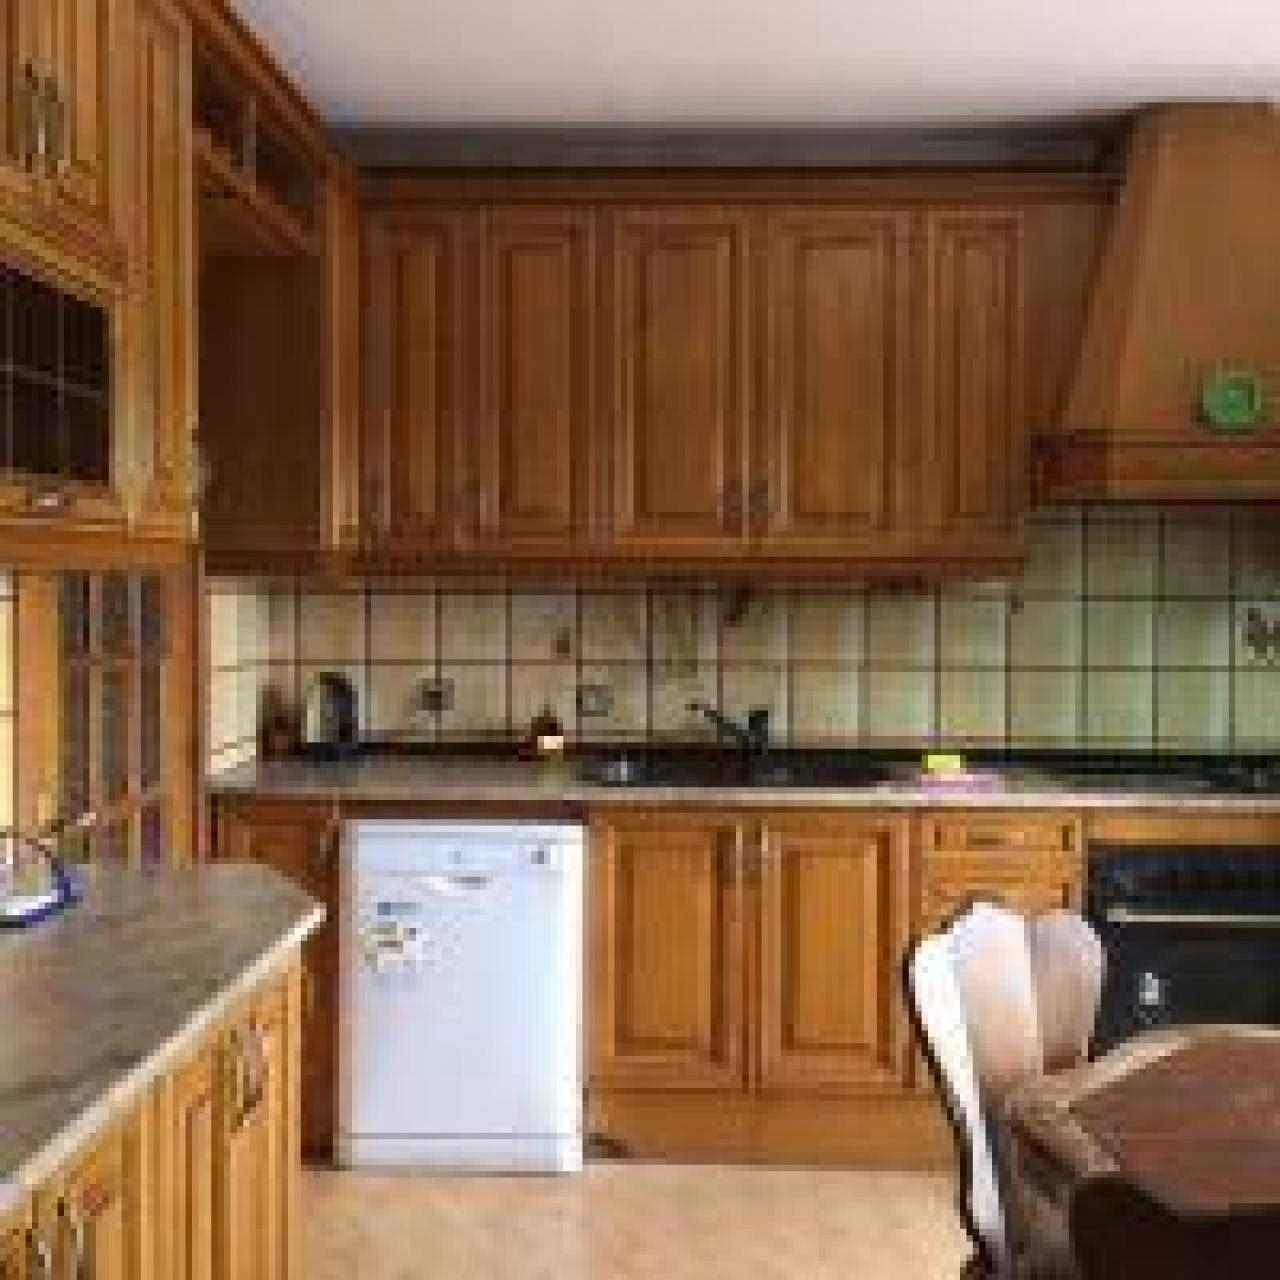 Alquiler de apartamentos Villaluenga de la Sagra, Toledo